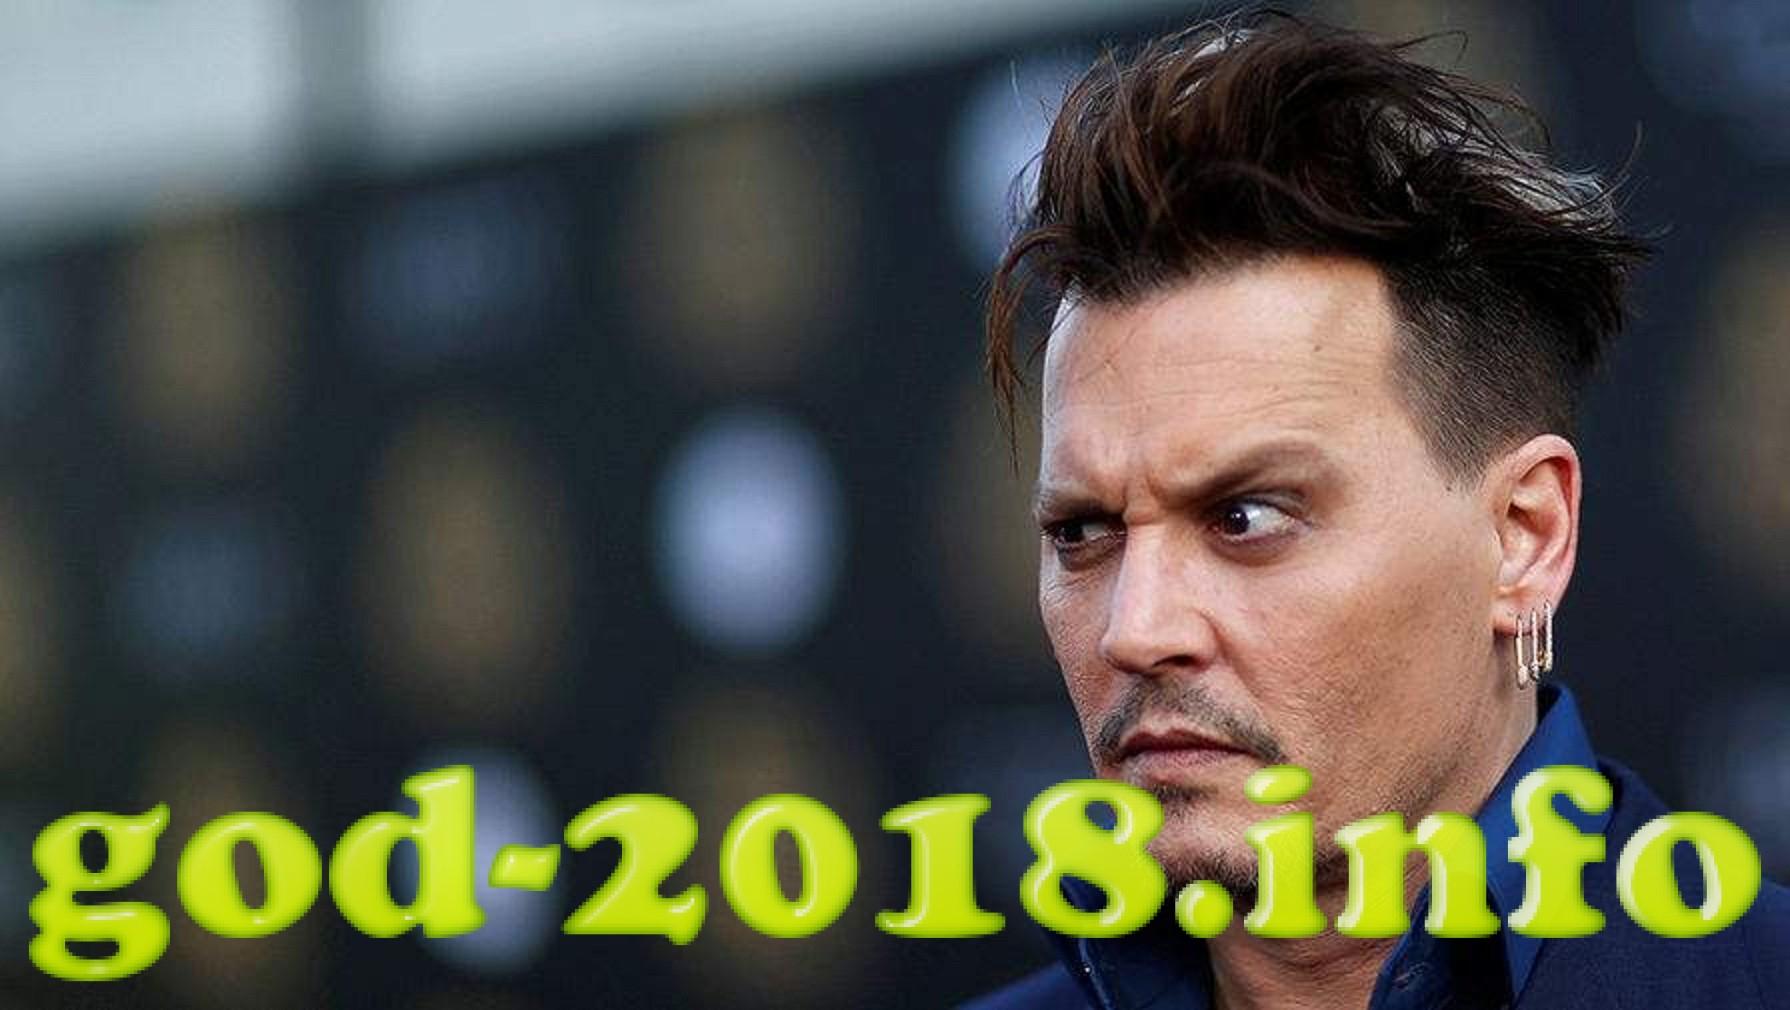 fantasticheskie-tvari-i-gde-oni-obitajut-chast-2-v-2018-godu-6